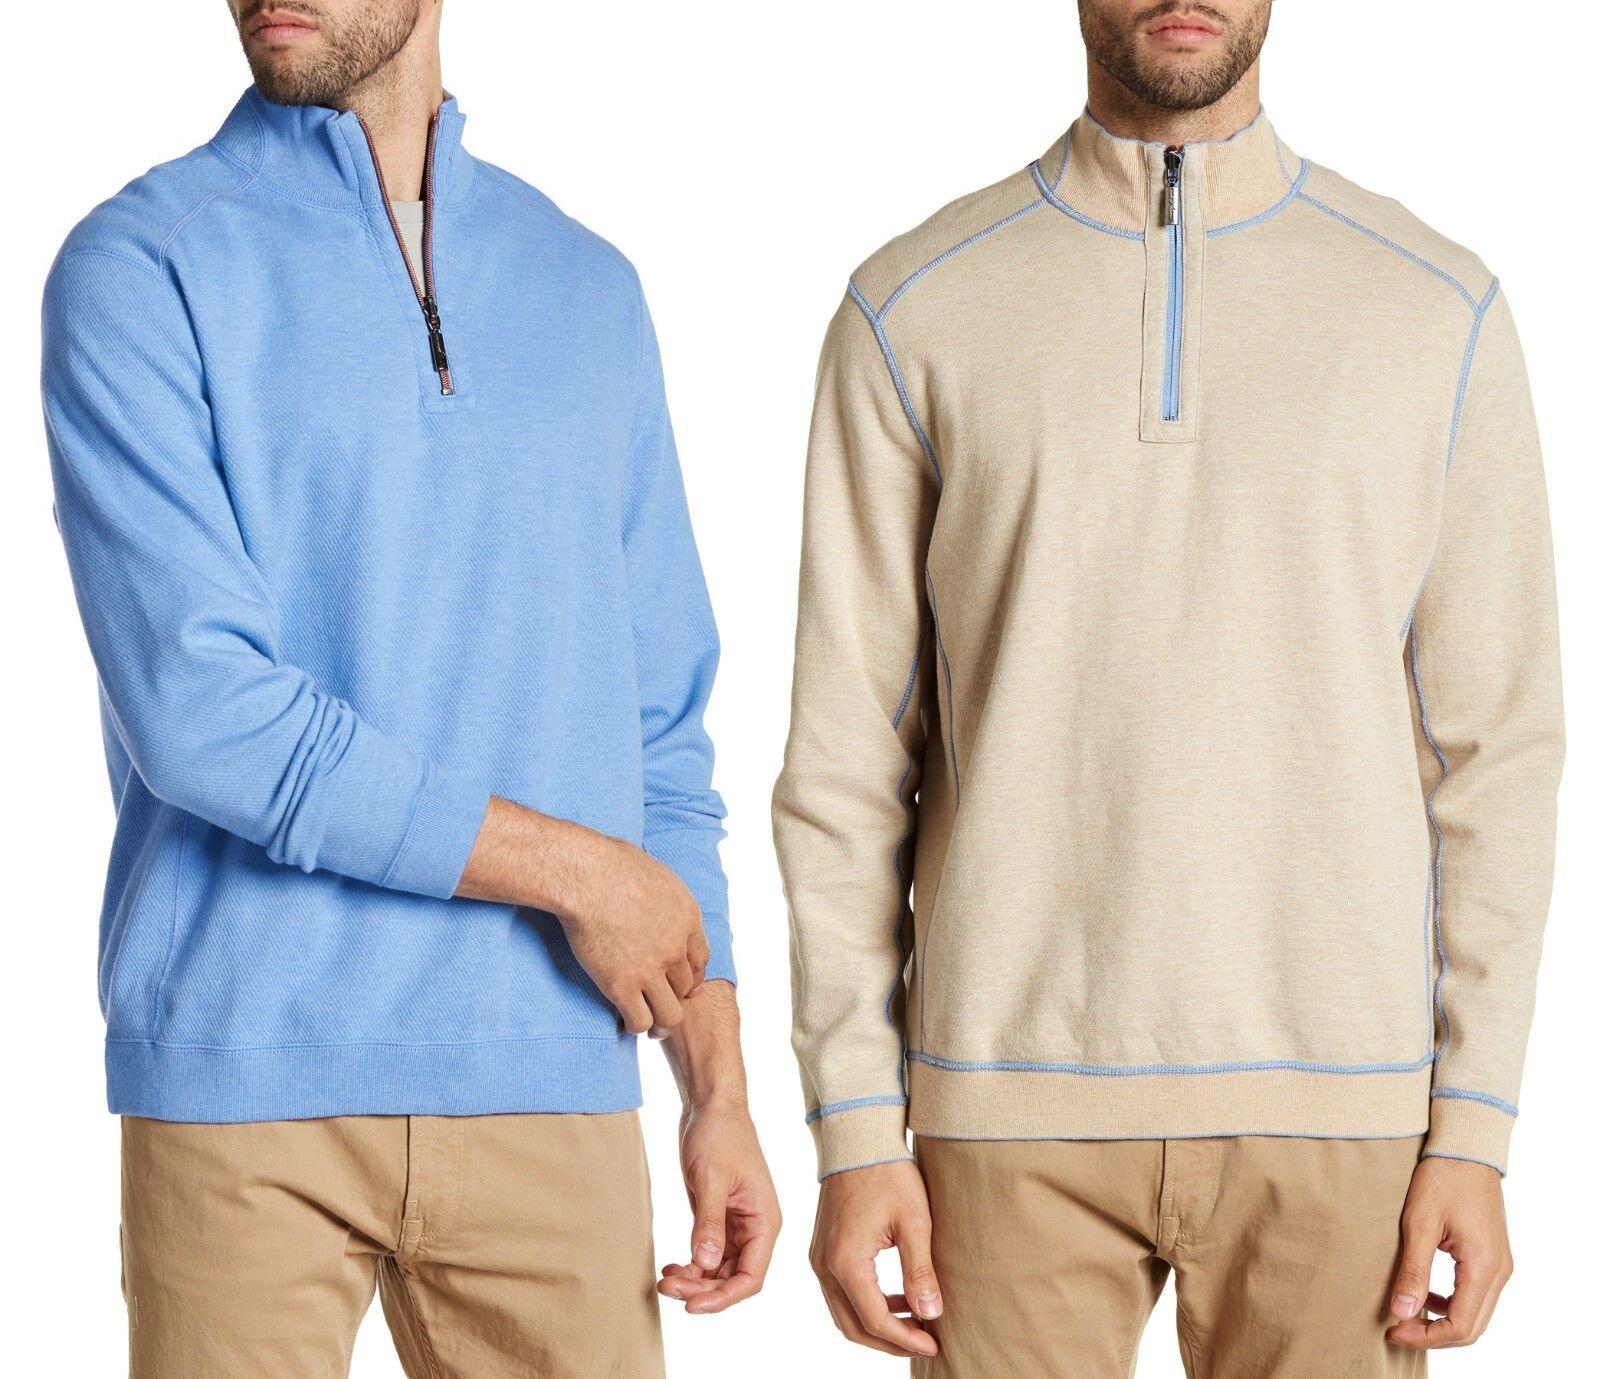 TOMMY BAHAMA Flip Side 1/2 Zip Reversible Sweater Sweatshirt Sz.Large NWT 98